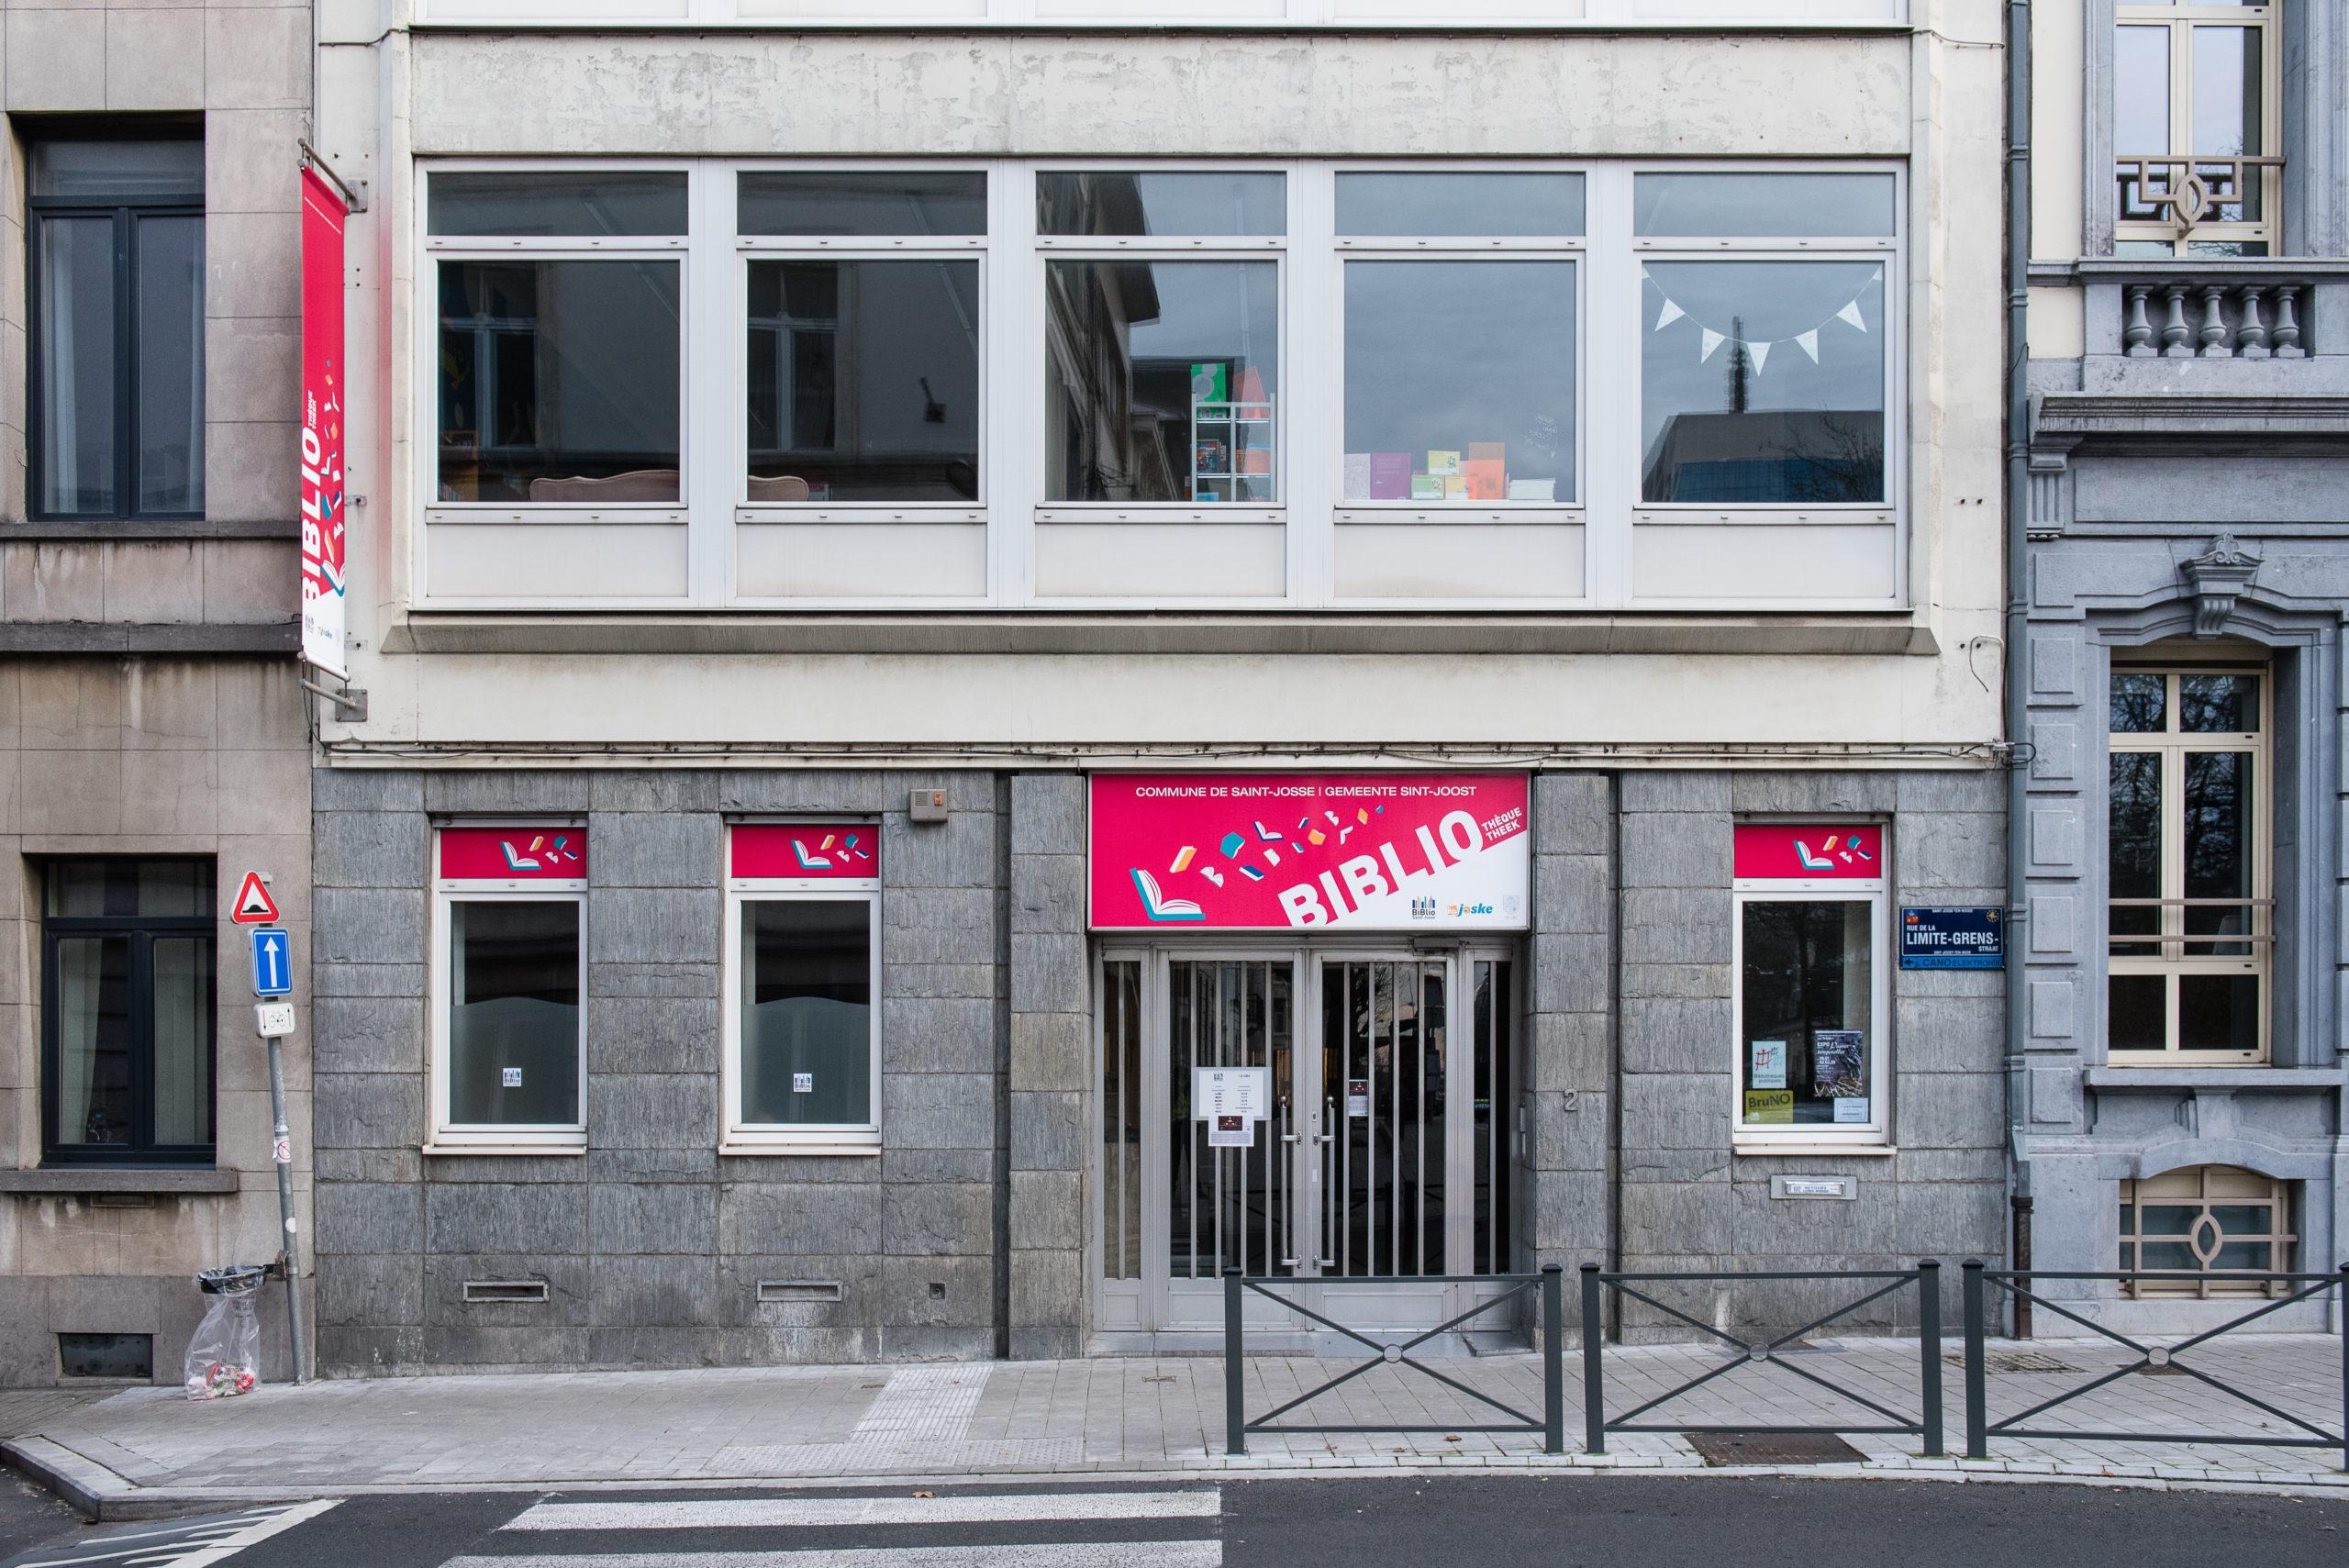 Bibliothèque – La Barricade 1210 Saint Josse